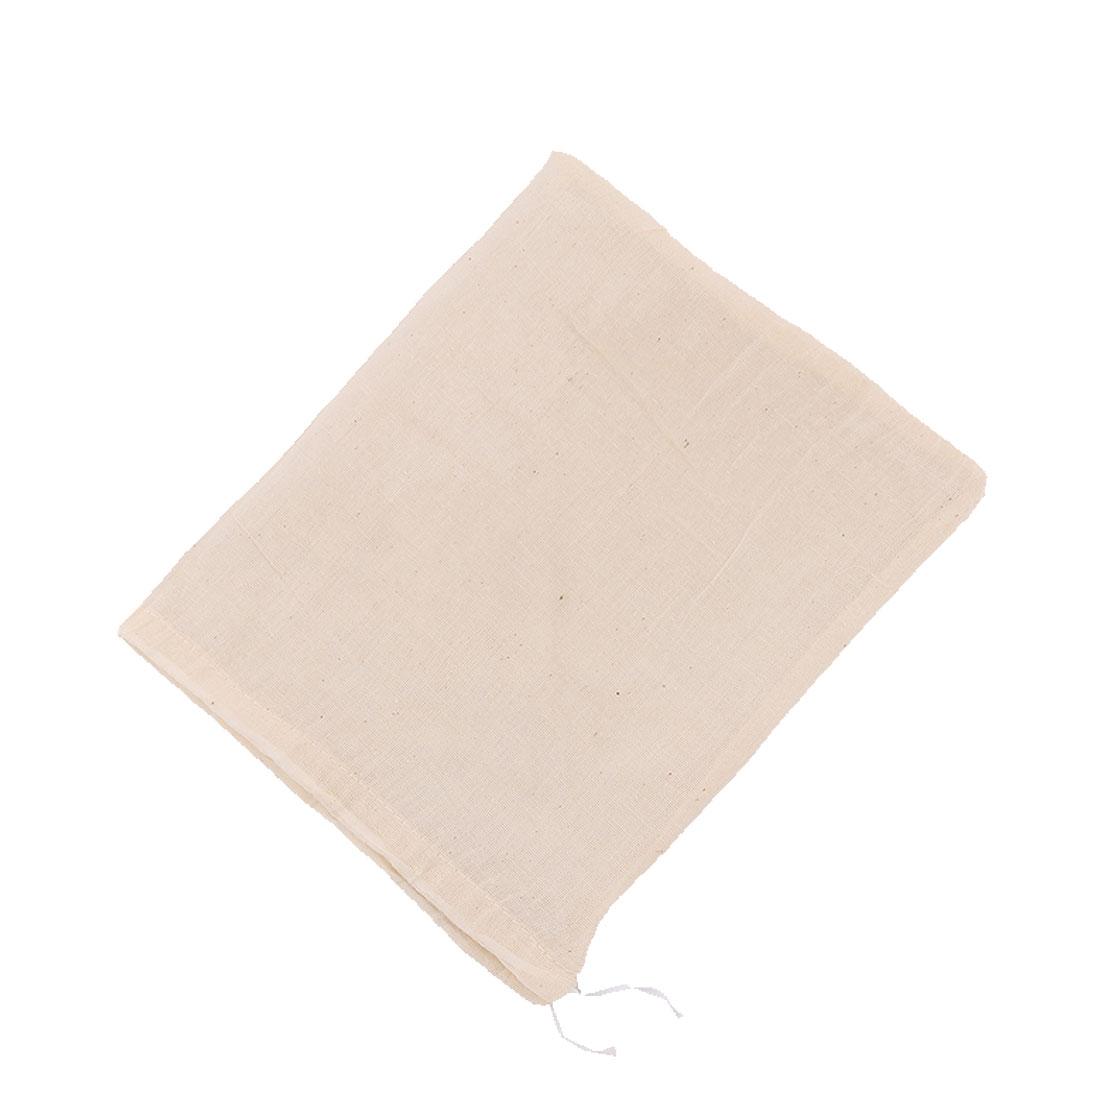 Fabric Drawstring Closure Design Food Soup Herbal Filter Bag Beige 37cm x 29cm